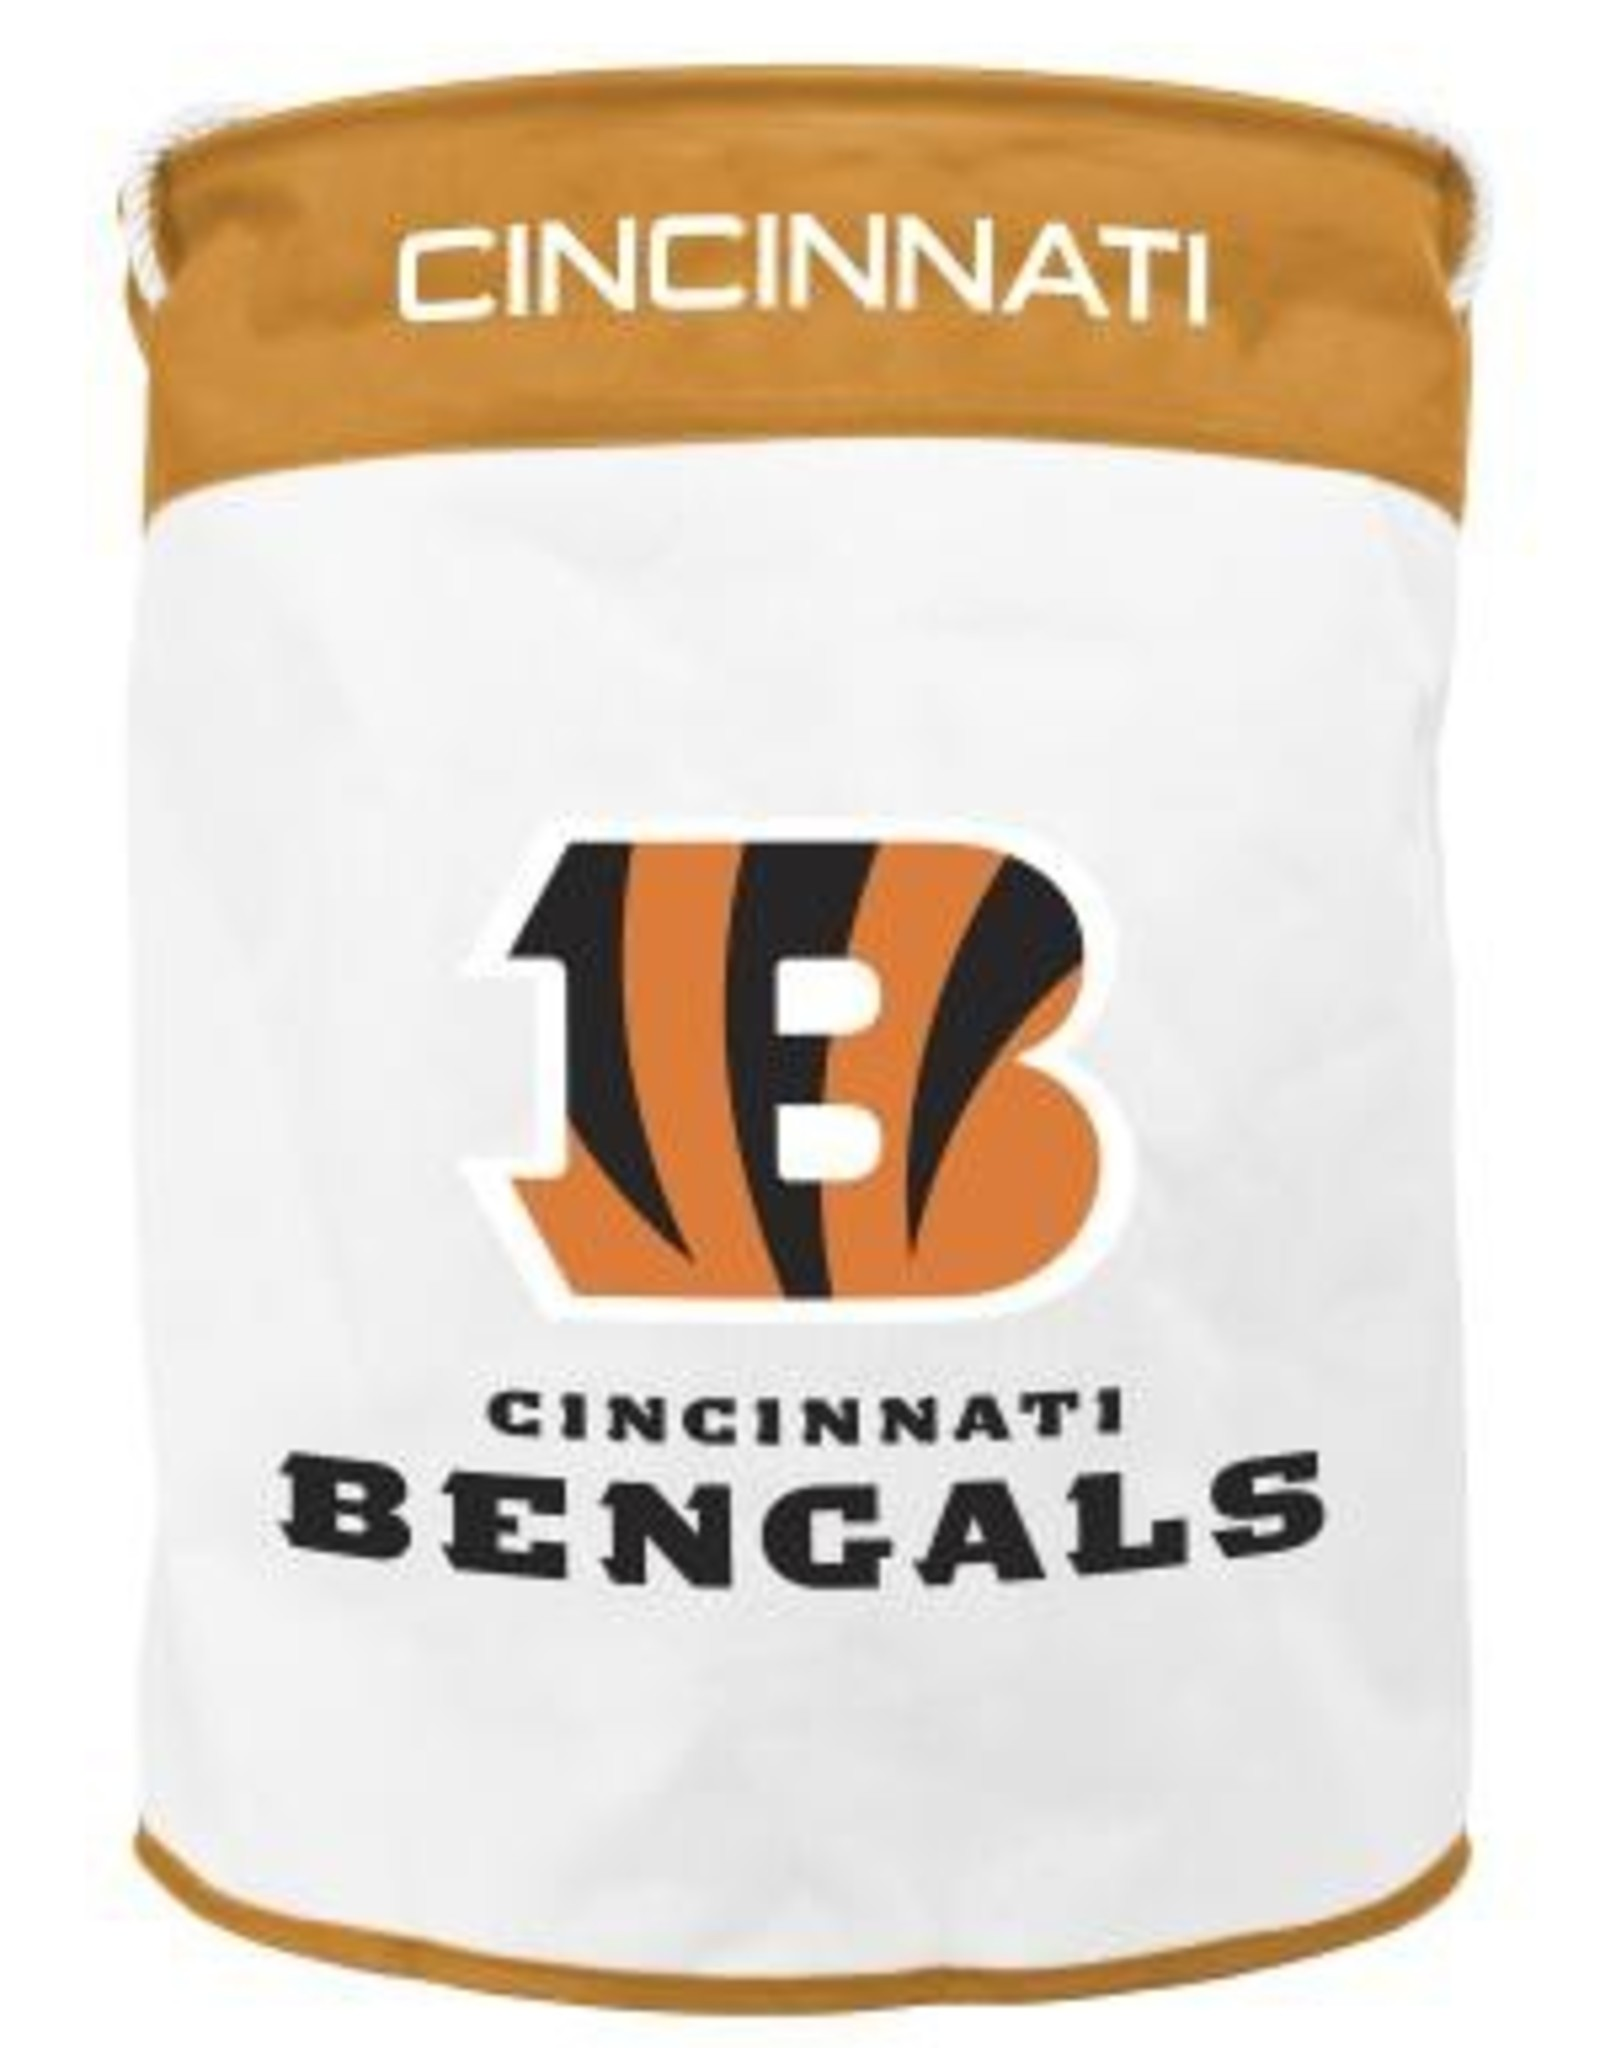 Cincinnati Bengals Canvas Laundry Basket